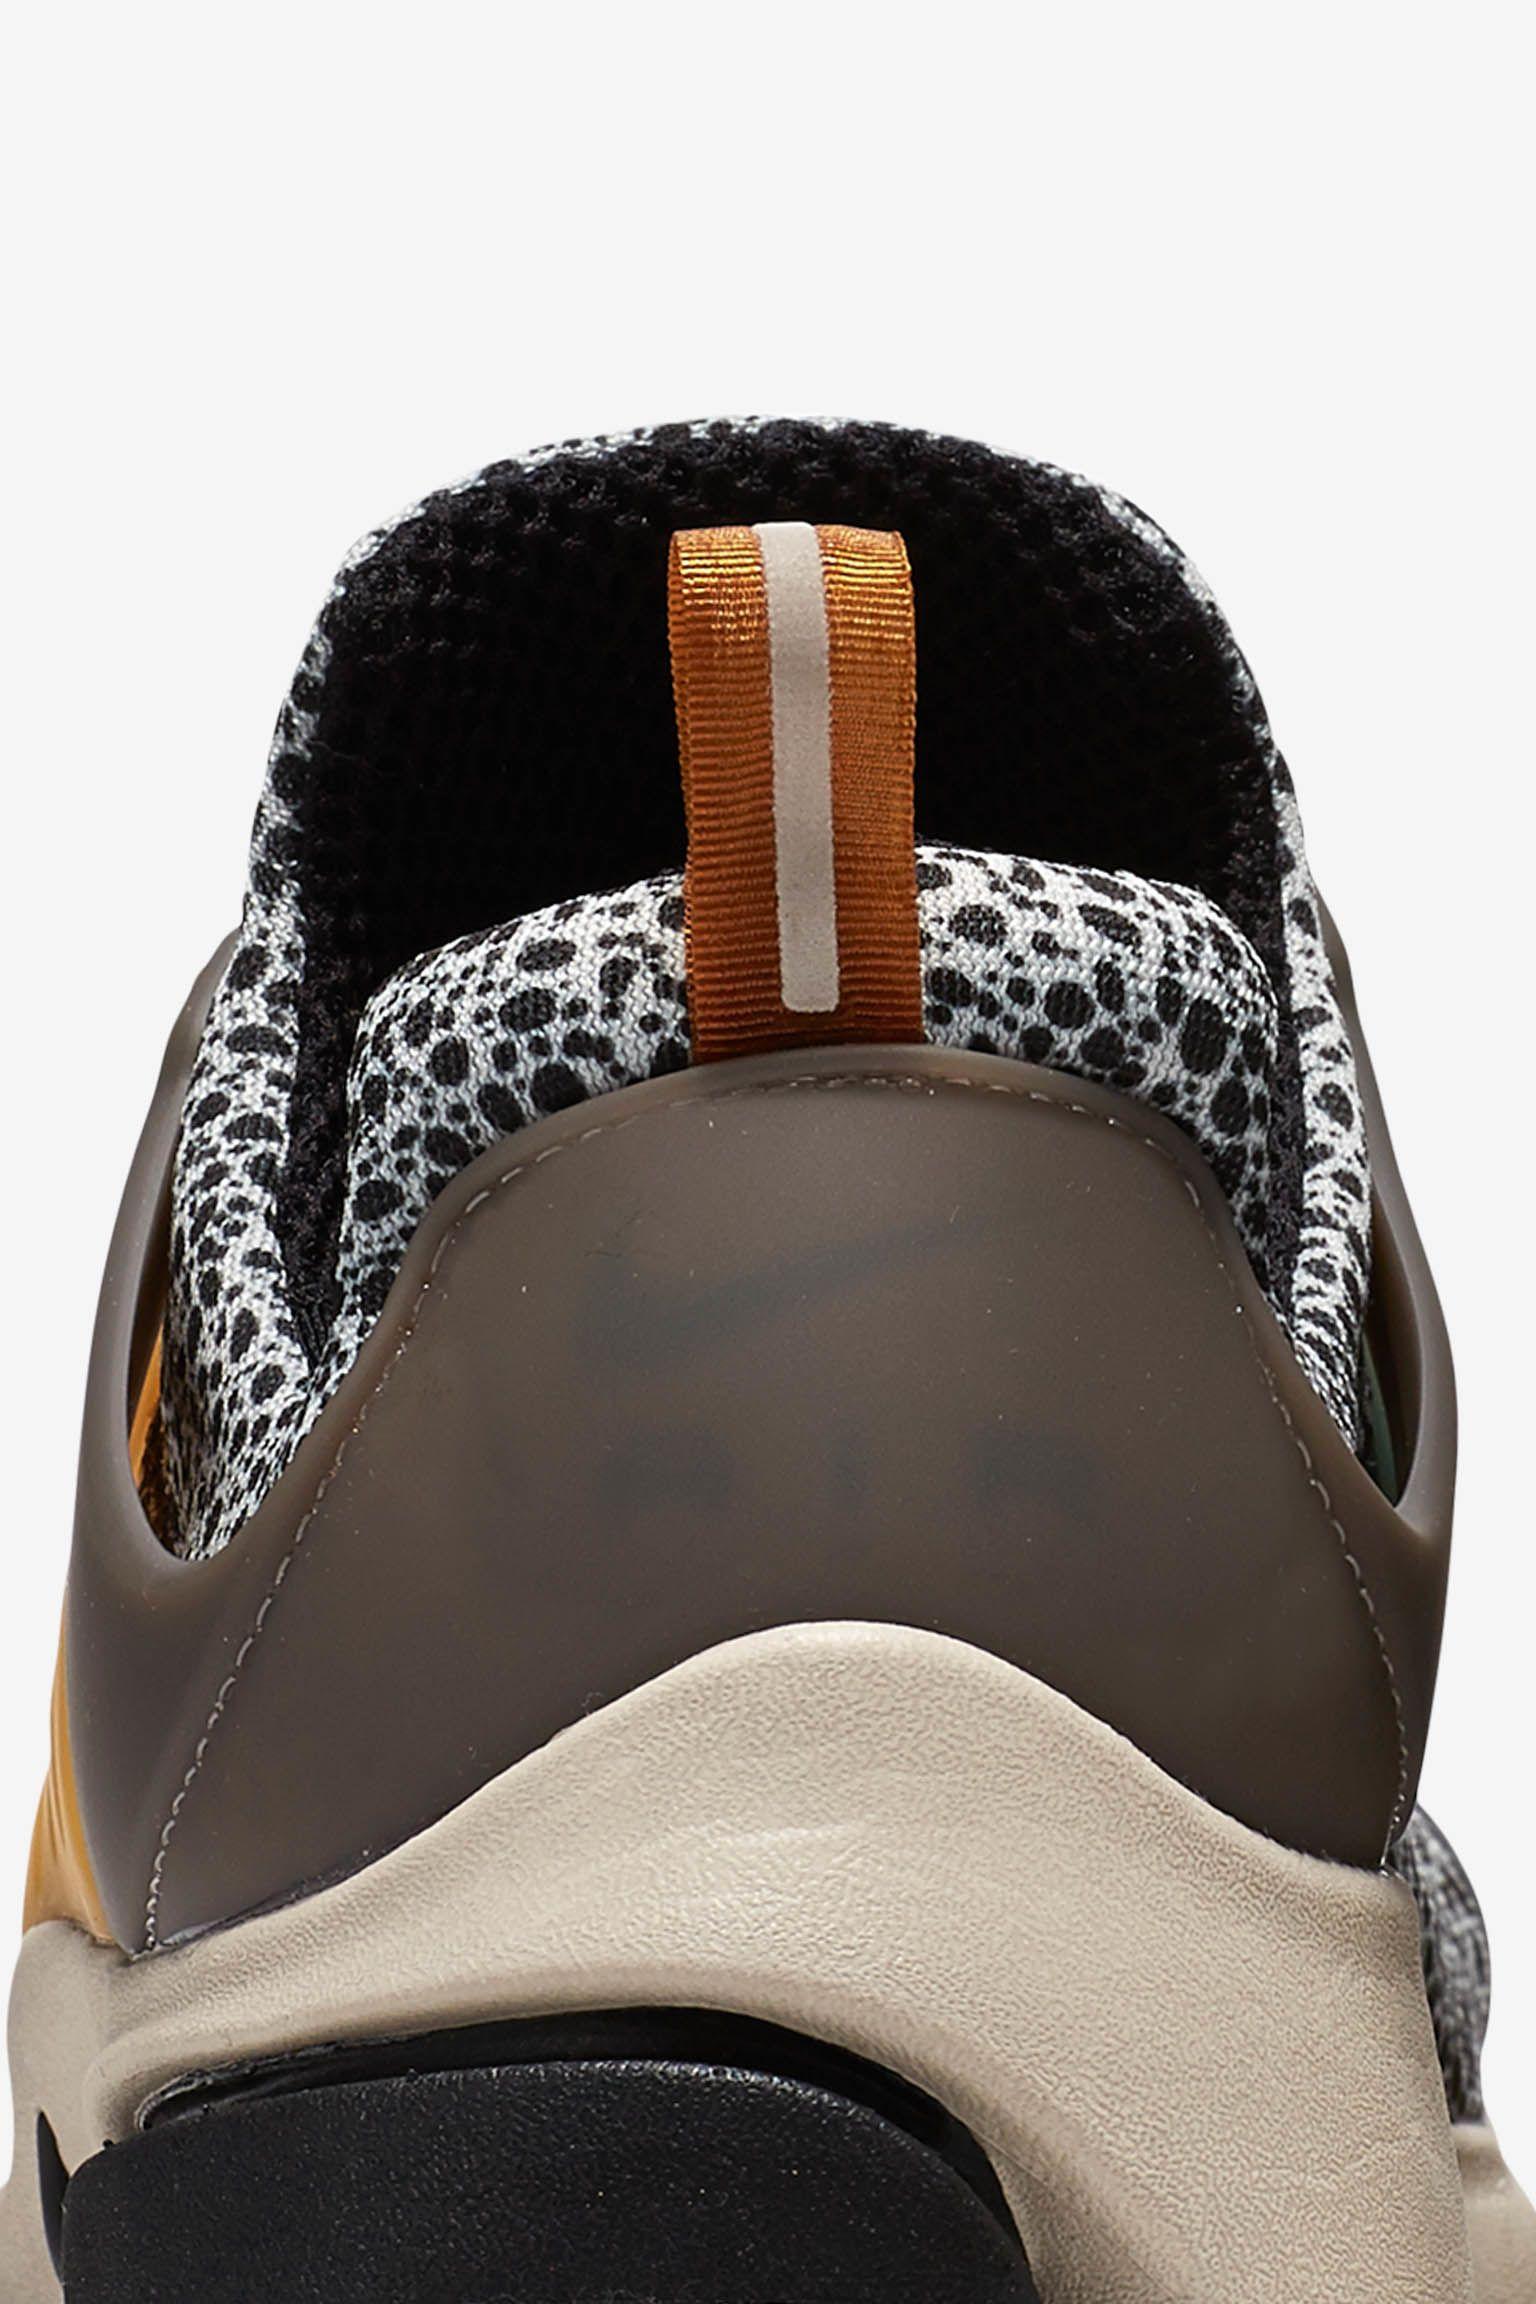 Nike Air Presto 'Safari' Release Date